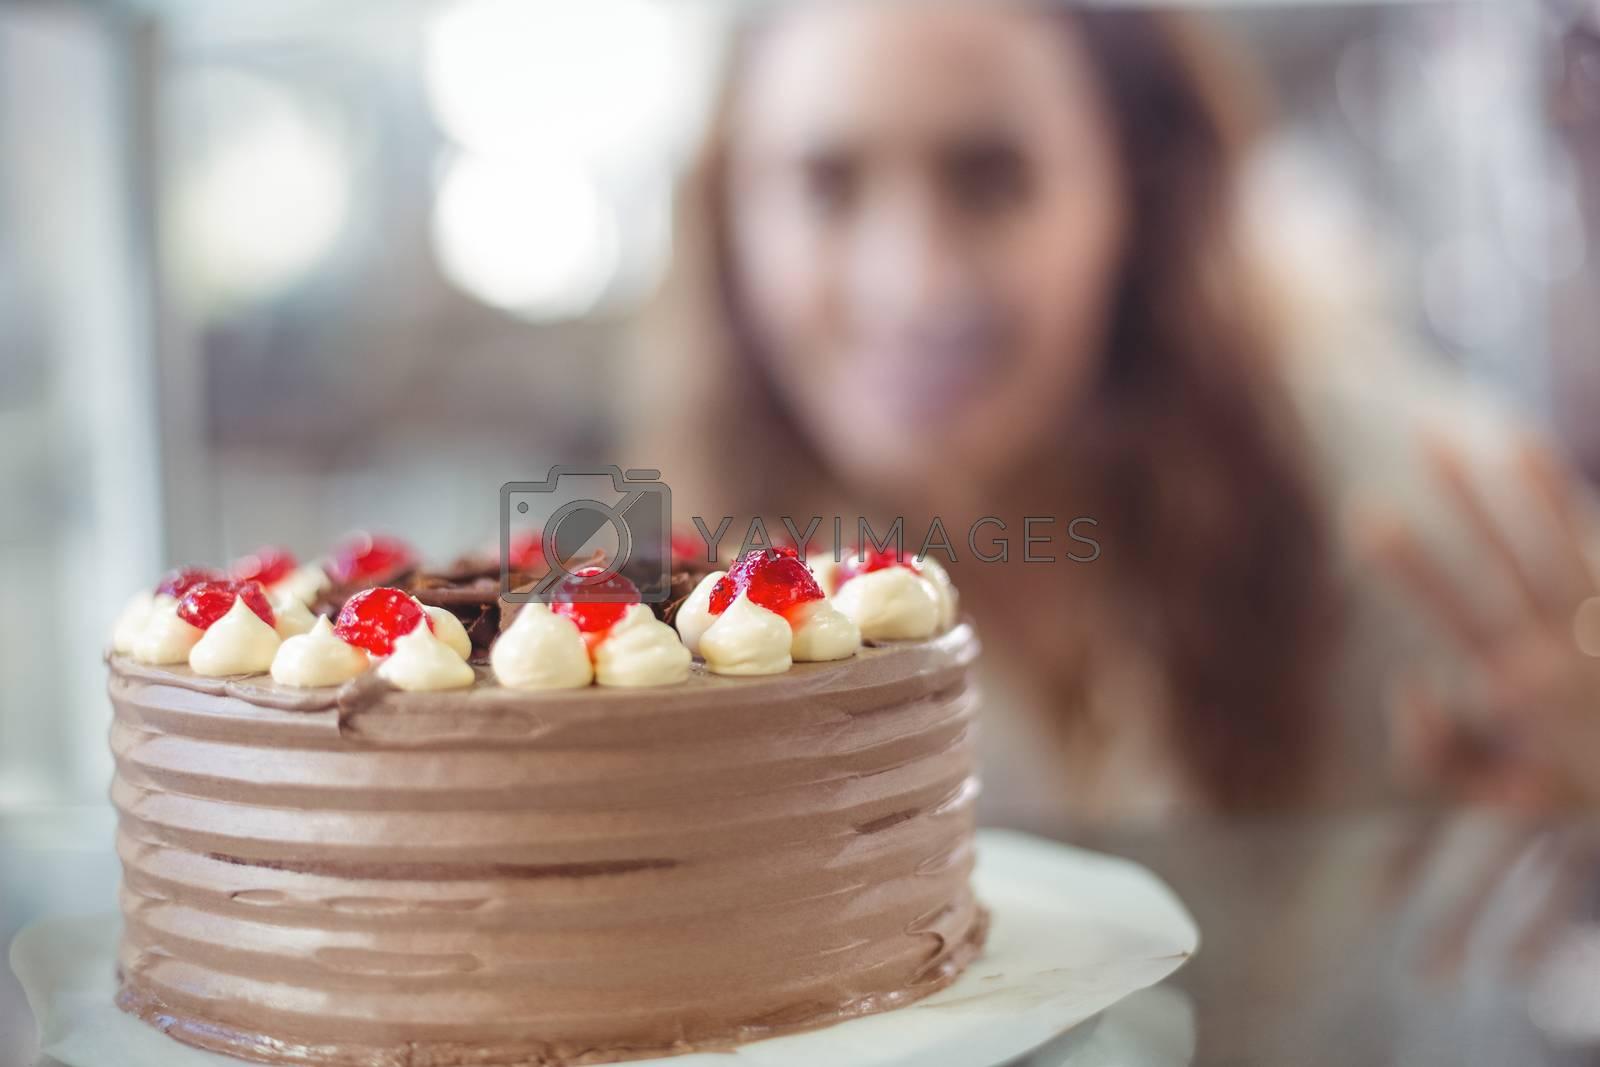 Royalty free image of Display case of chocolate cake by Wavebreakmedia